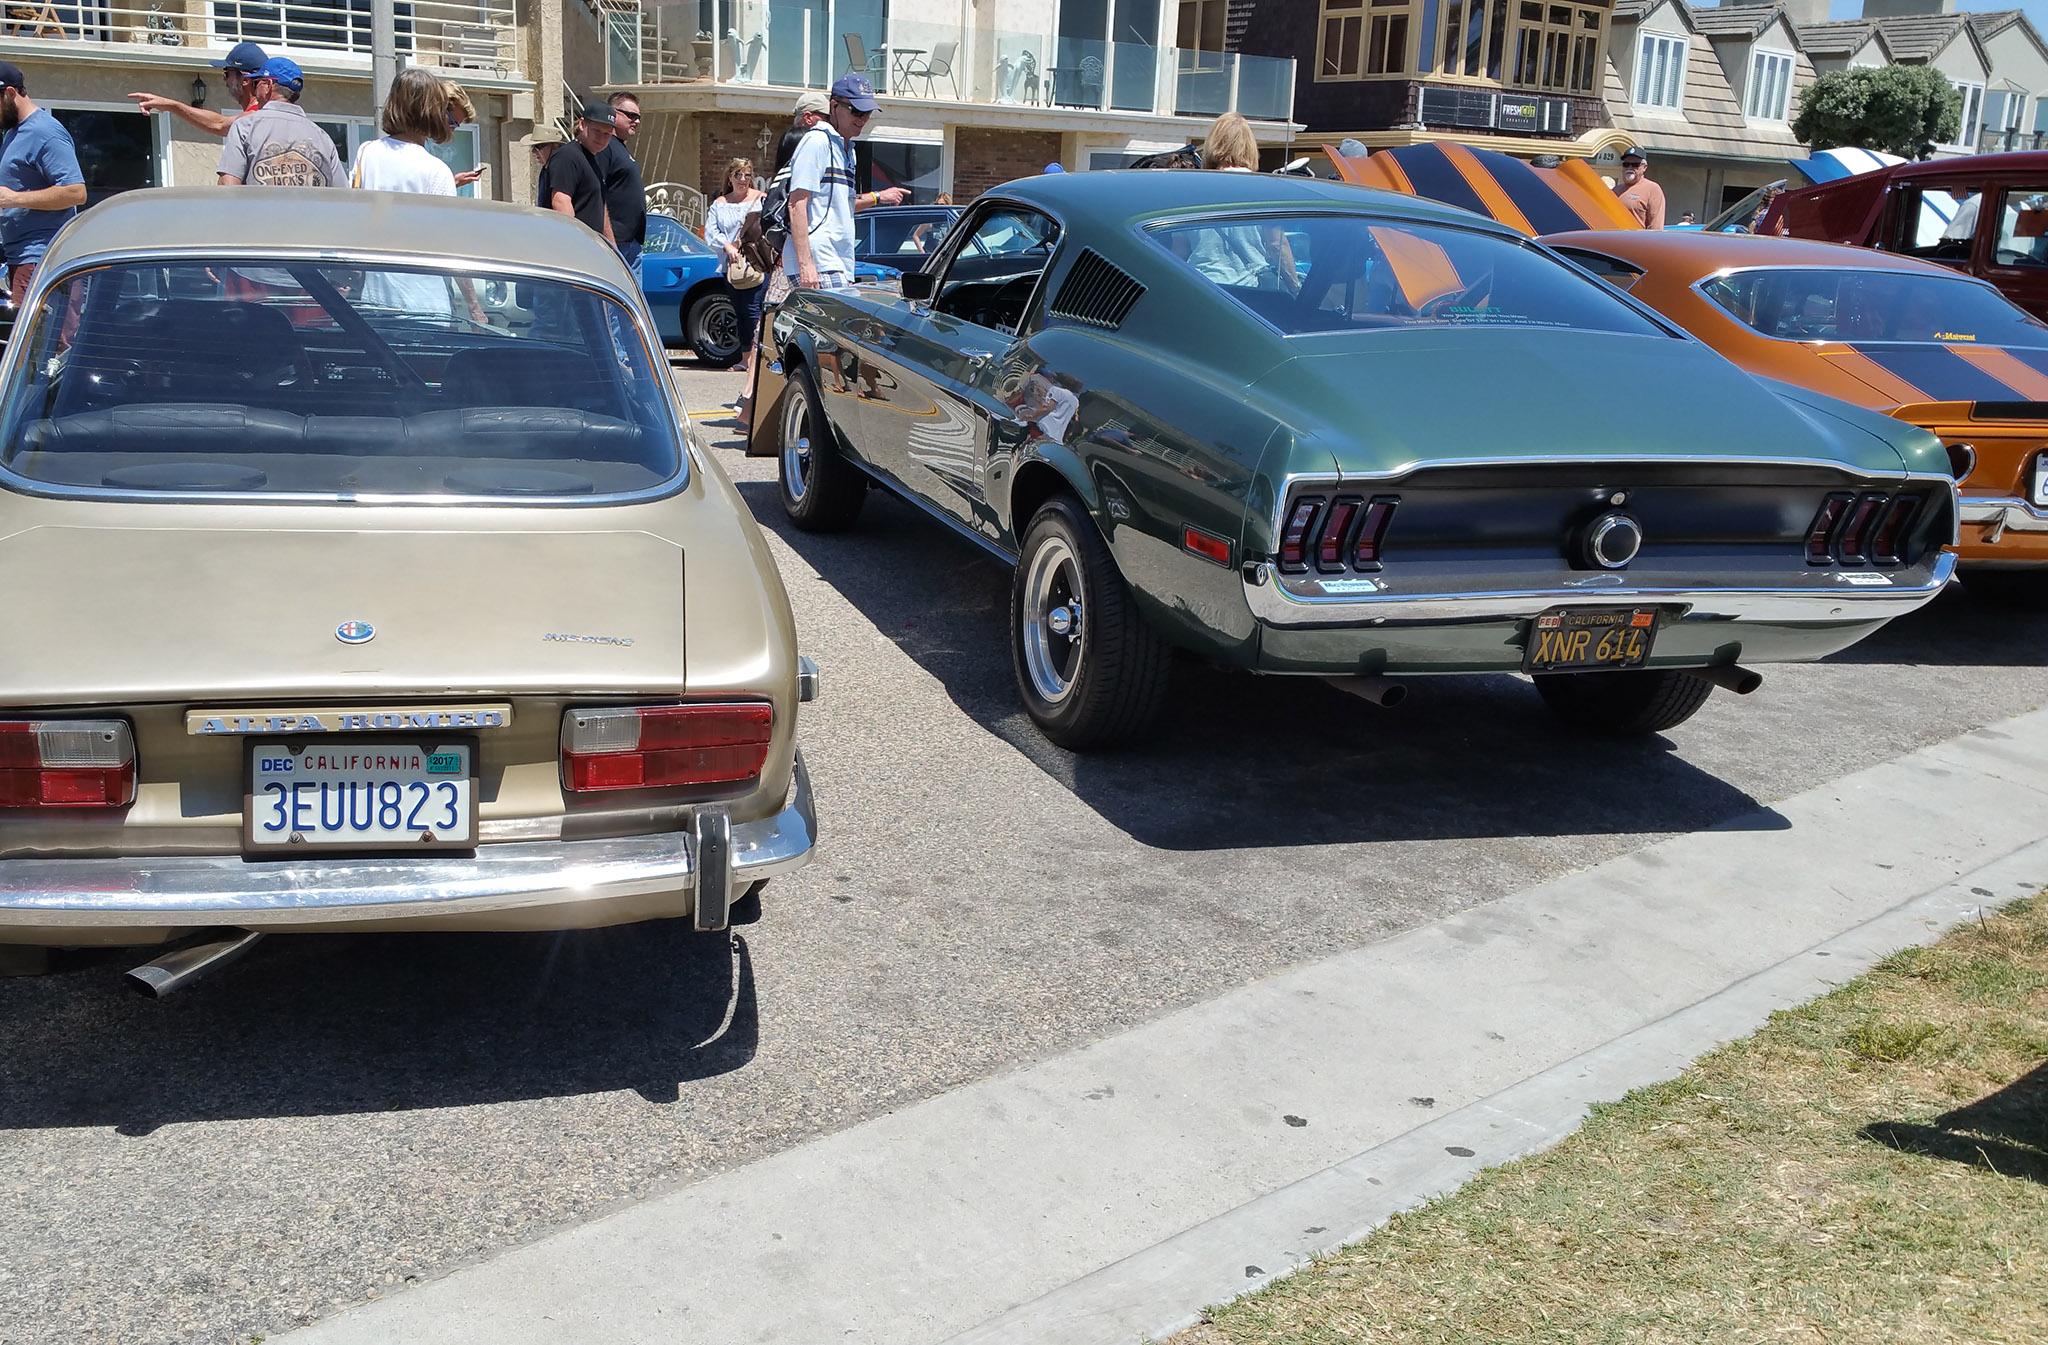 Show more & The Vintage Metal of the 30th Annual Seal Beach Classic Car Show ... markmcfarlin.com